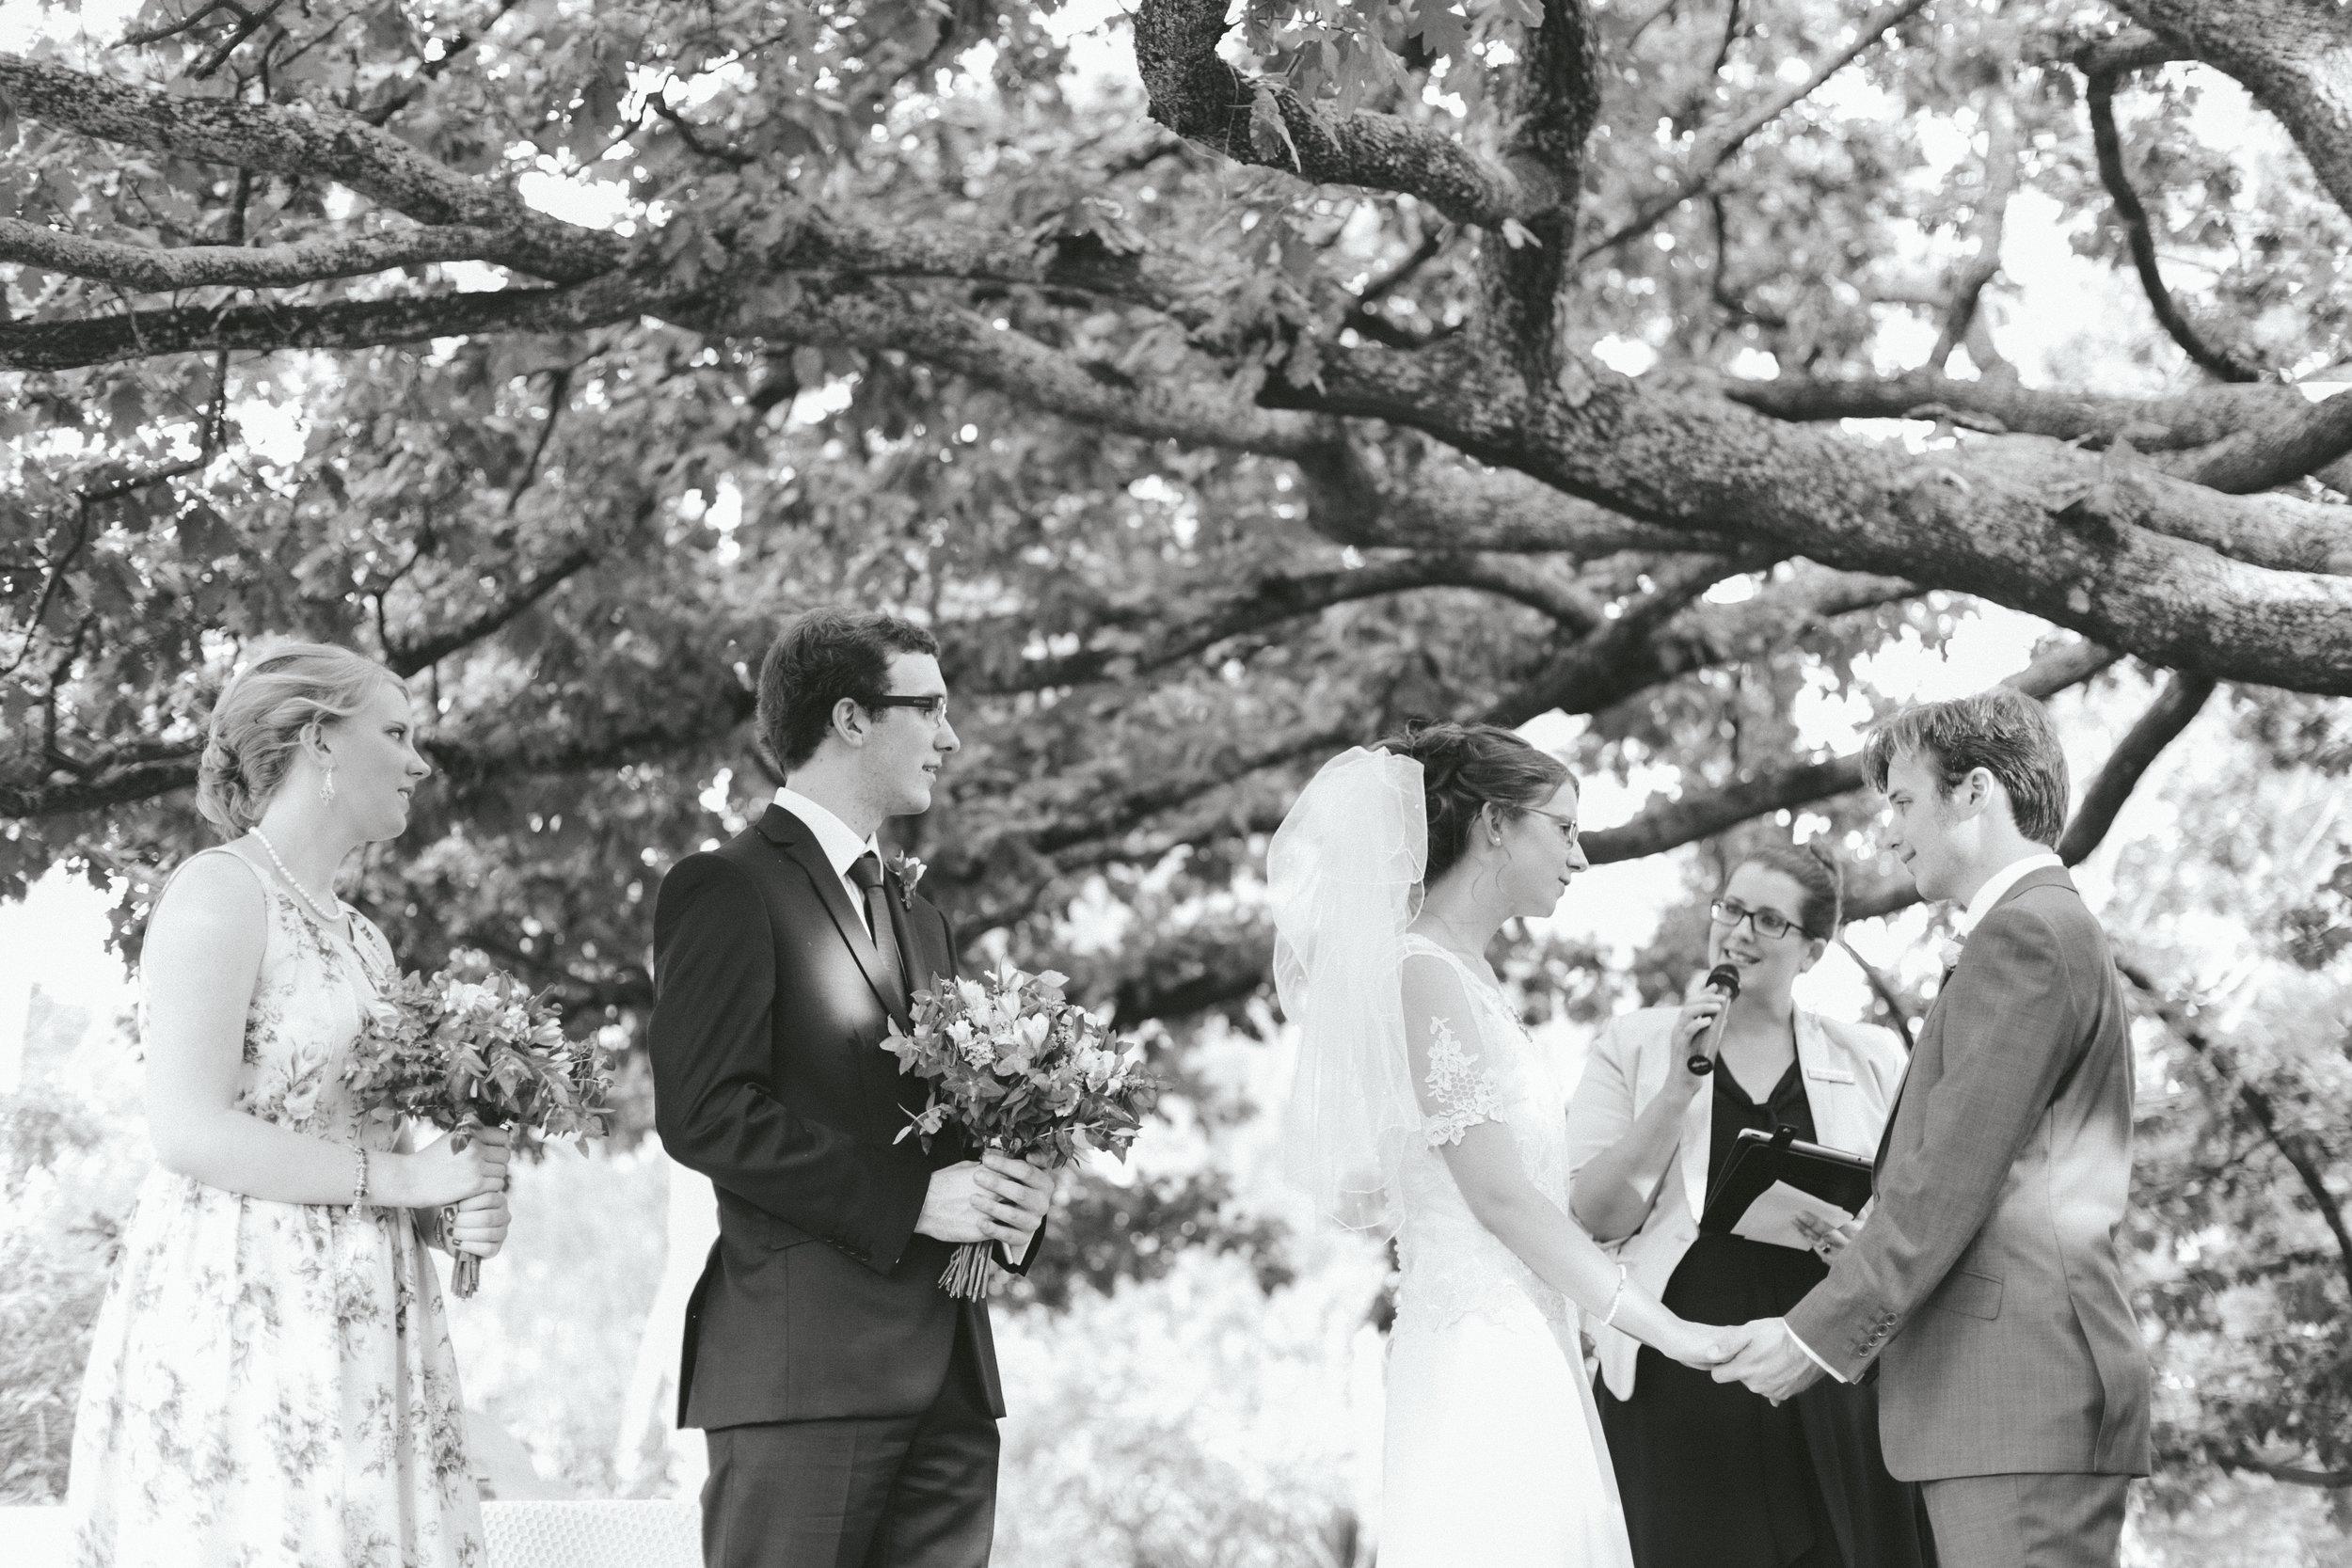 Melbourne Marriage Celebrant Dandenong Ranges